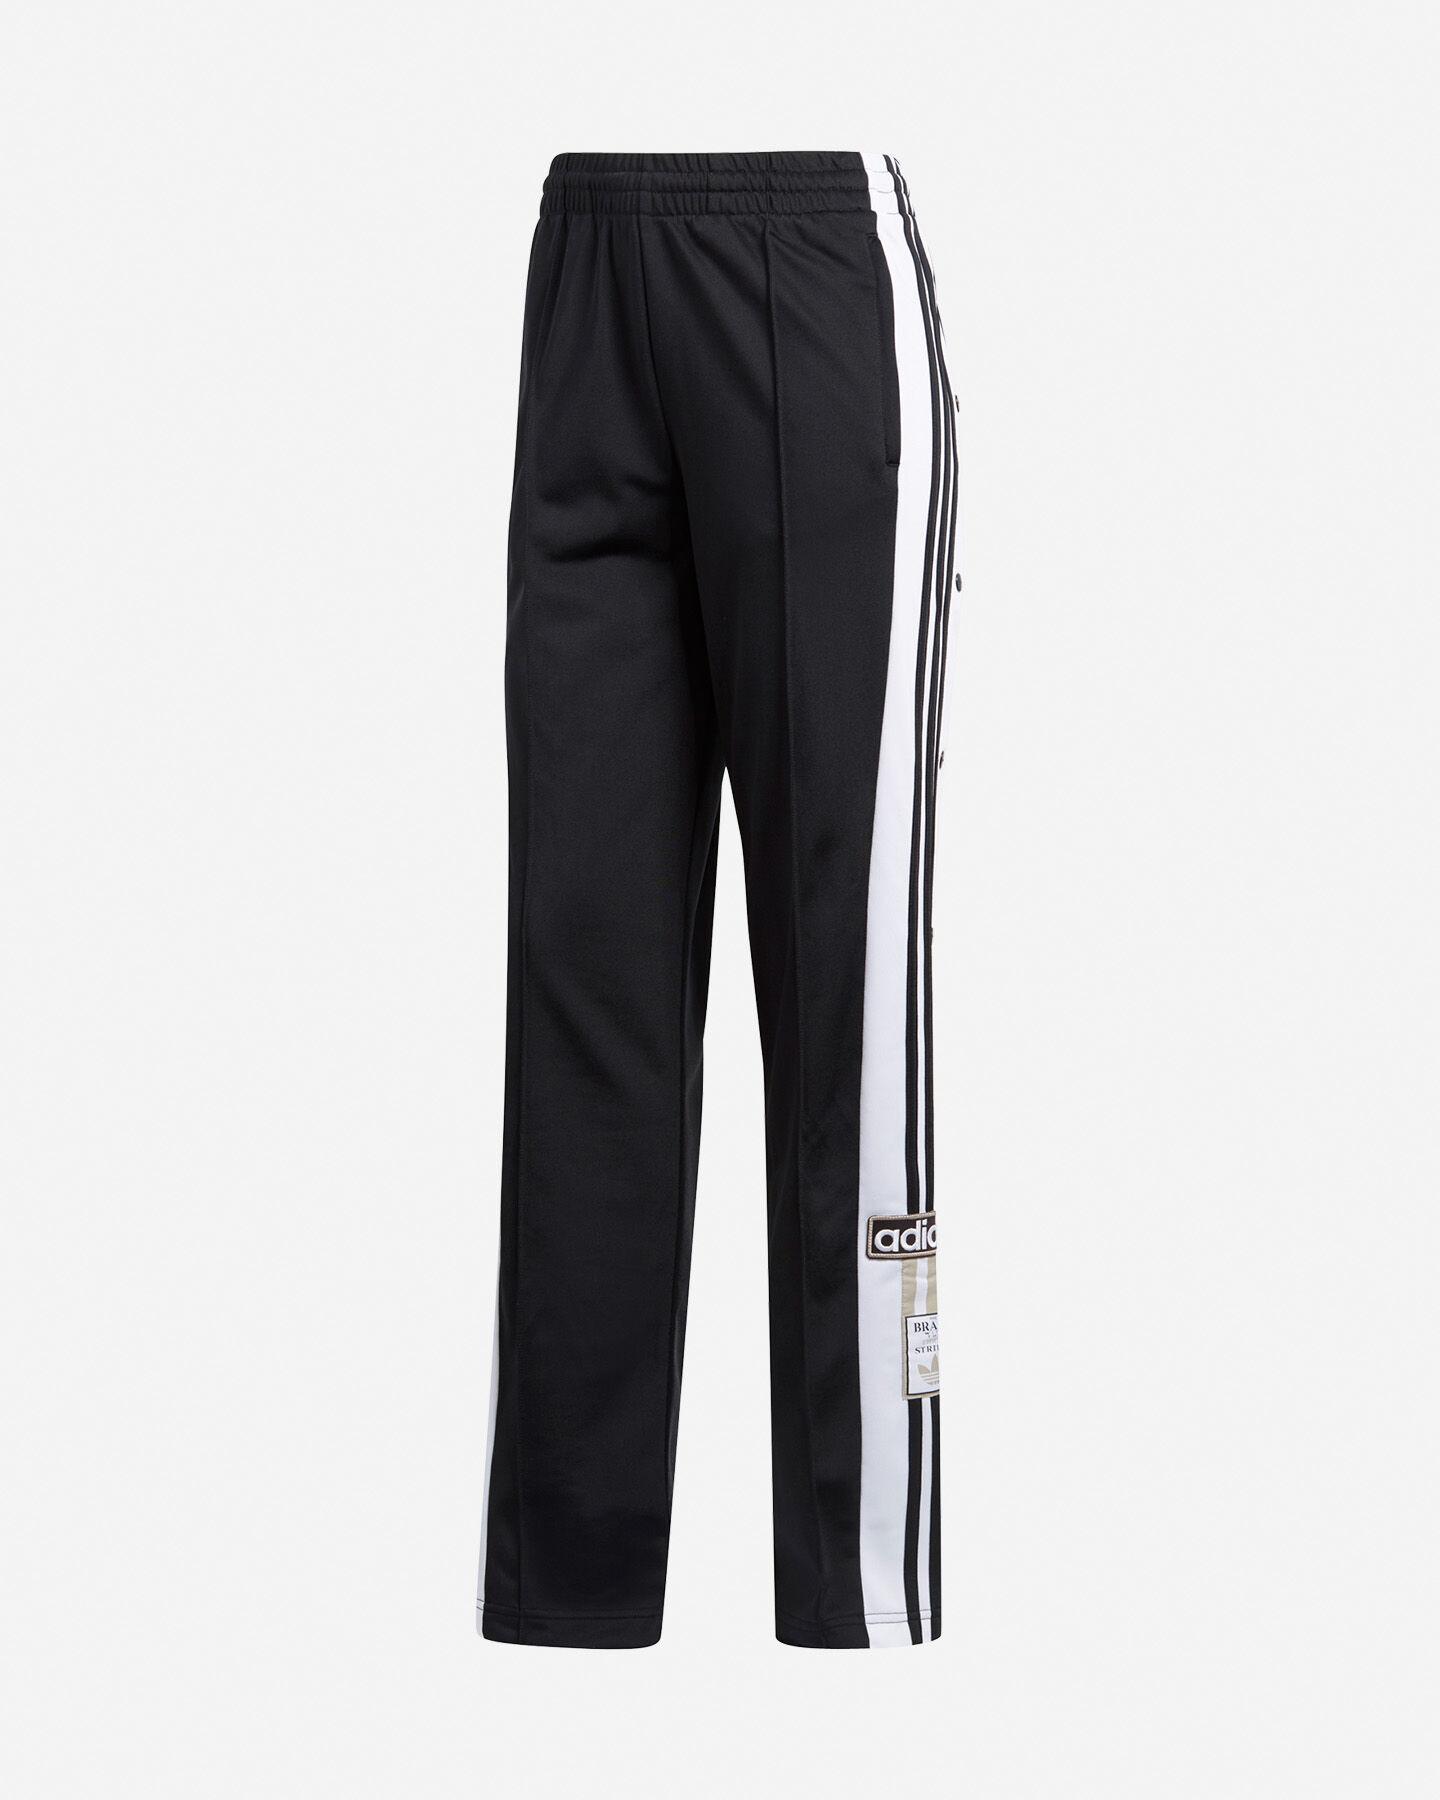 pantaloni adidas adibreak donna